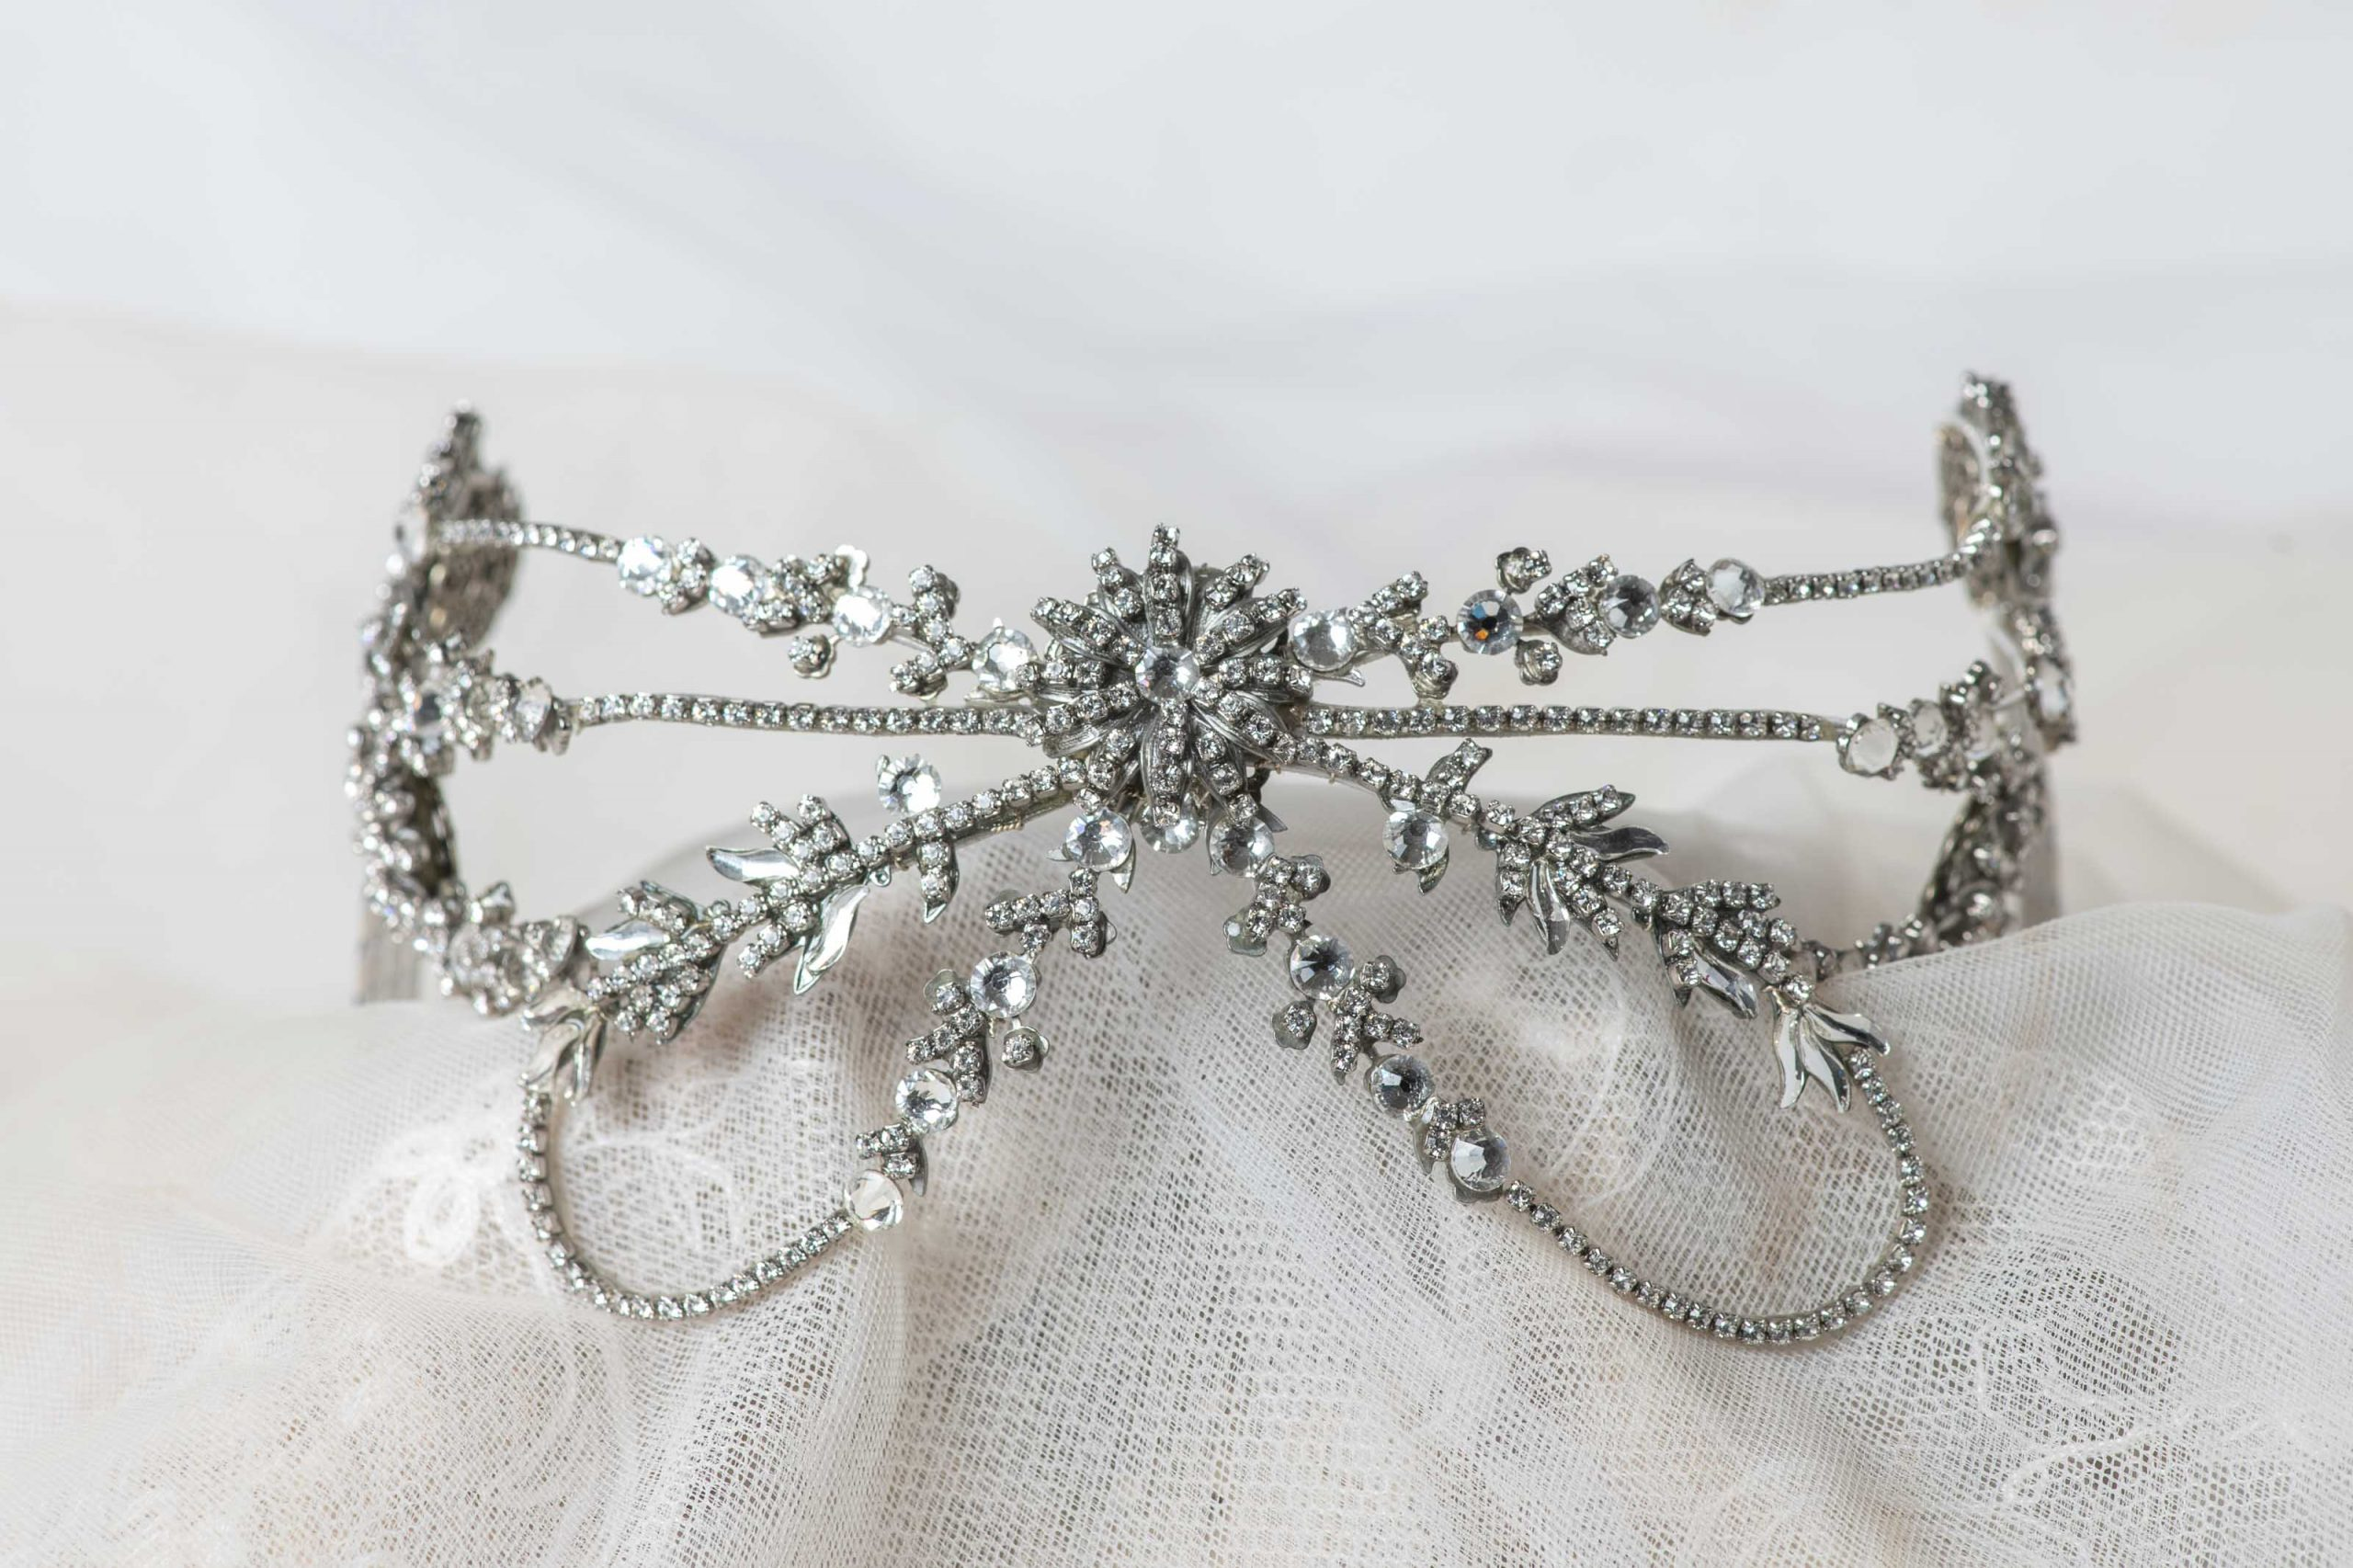 Tiara/peineta hecha totalmente a mano en cristal de Swarovski.